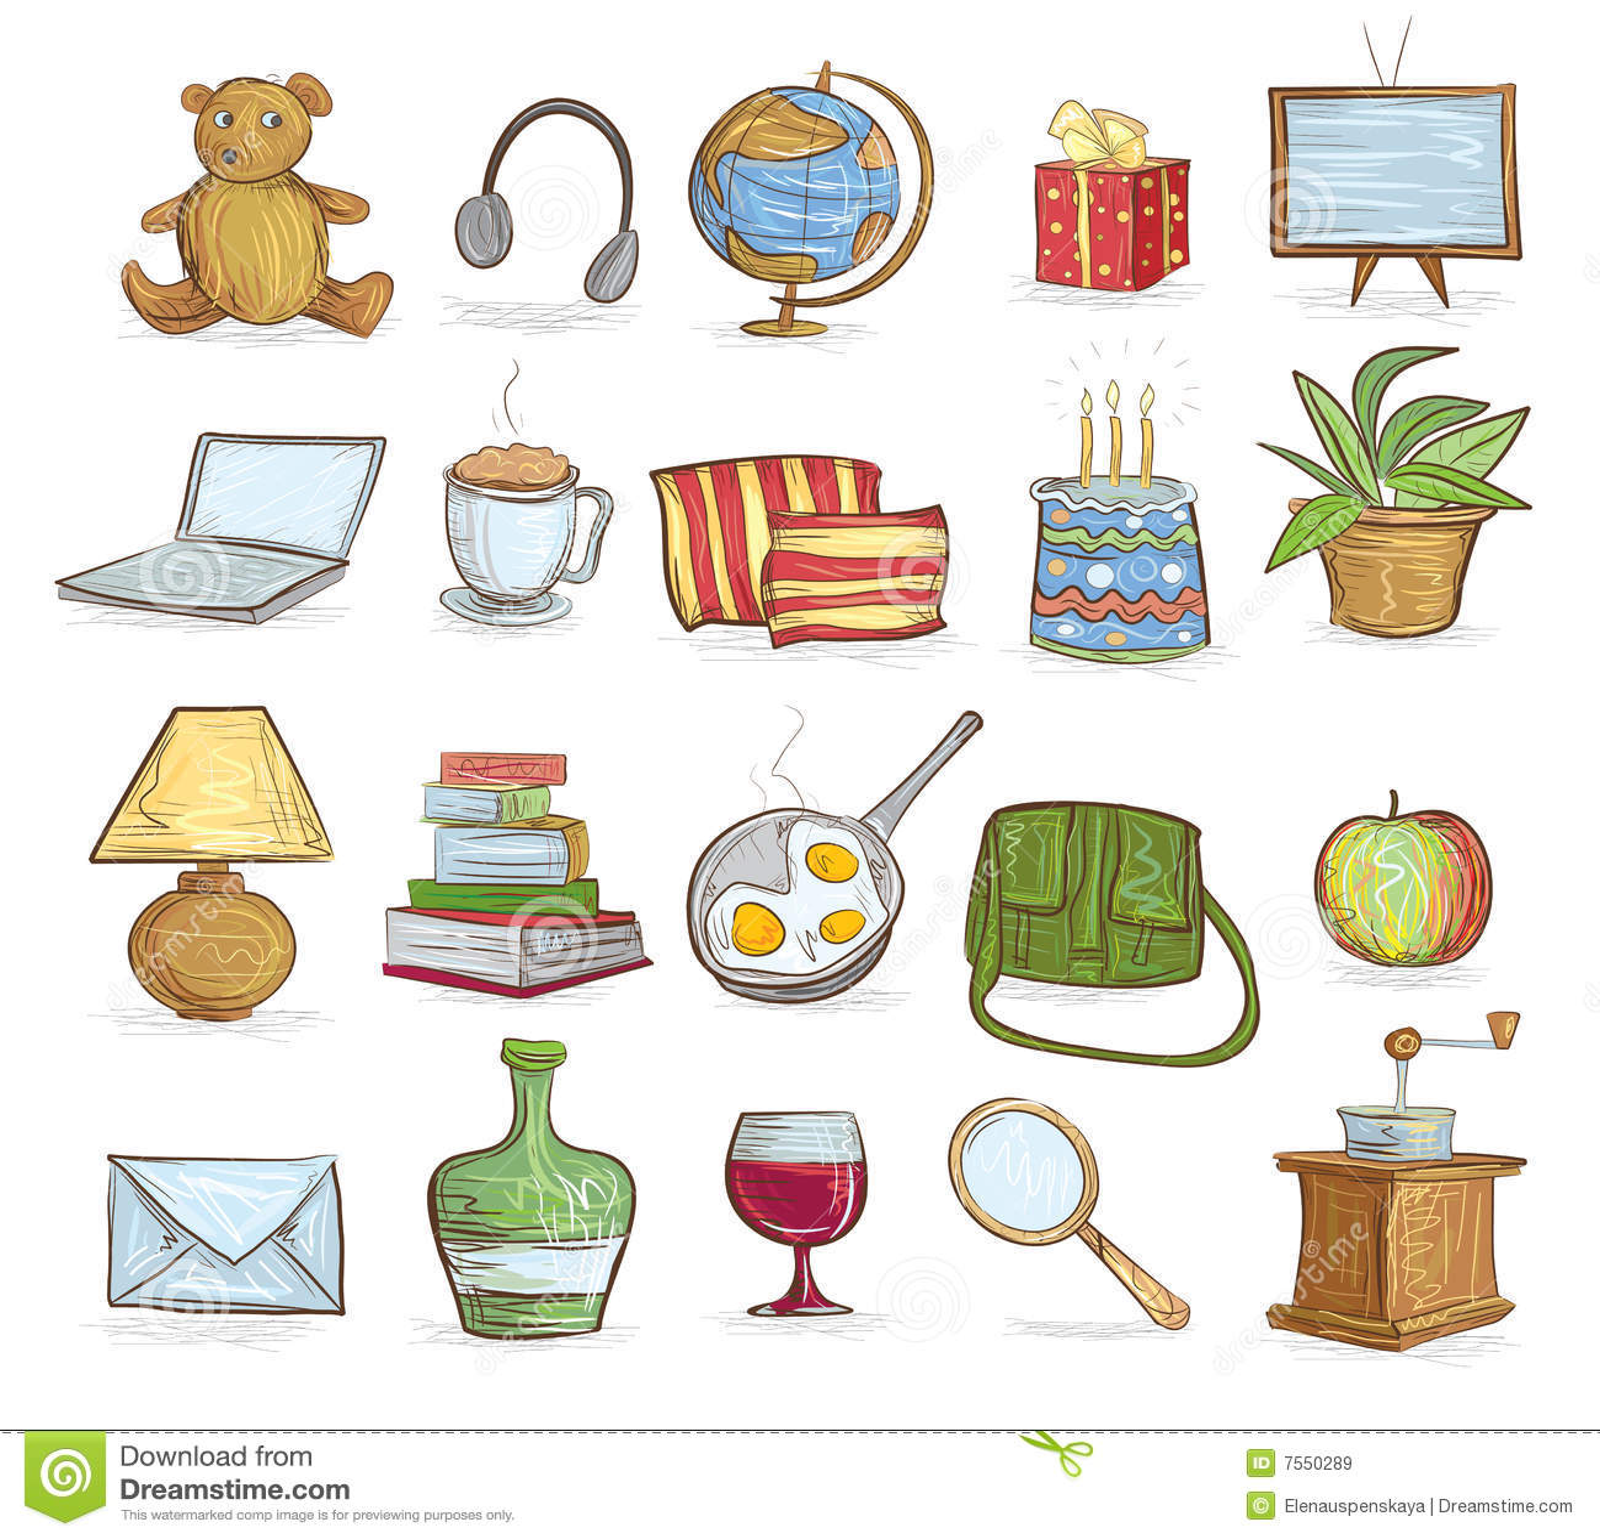 Objetos del hogar im genes de archivo libres de regal as for Objetos para el hogar